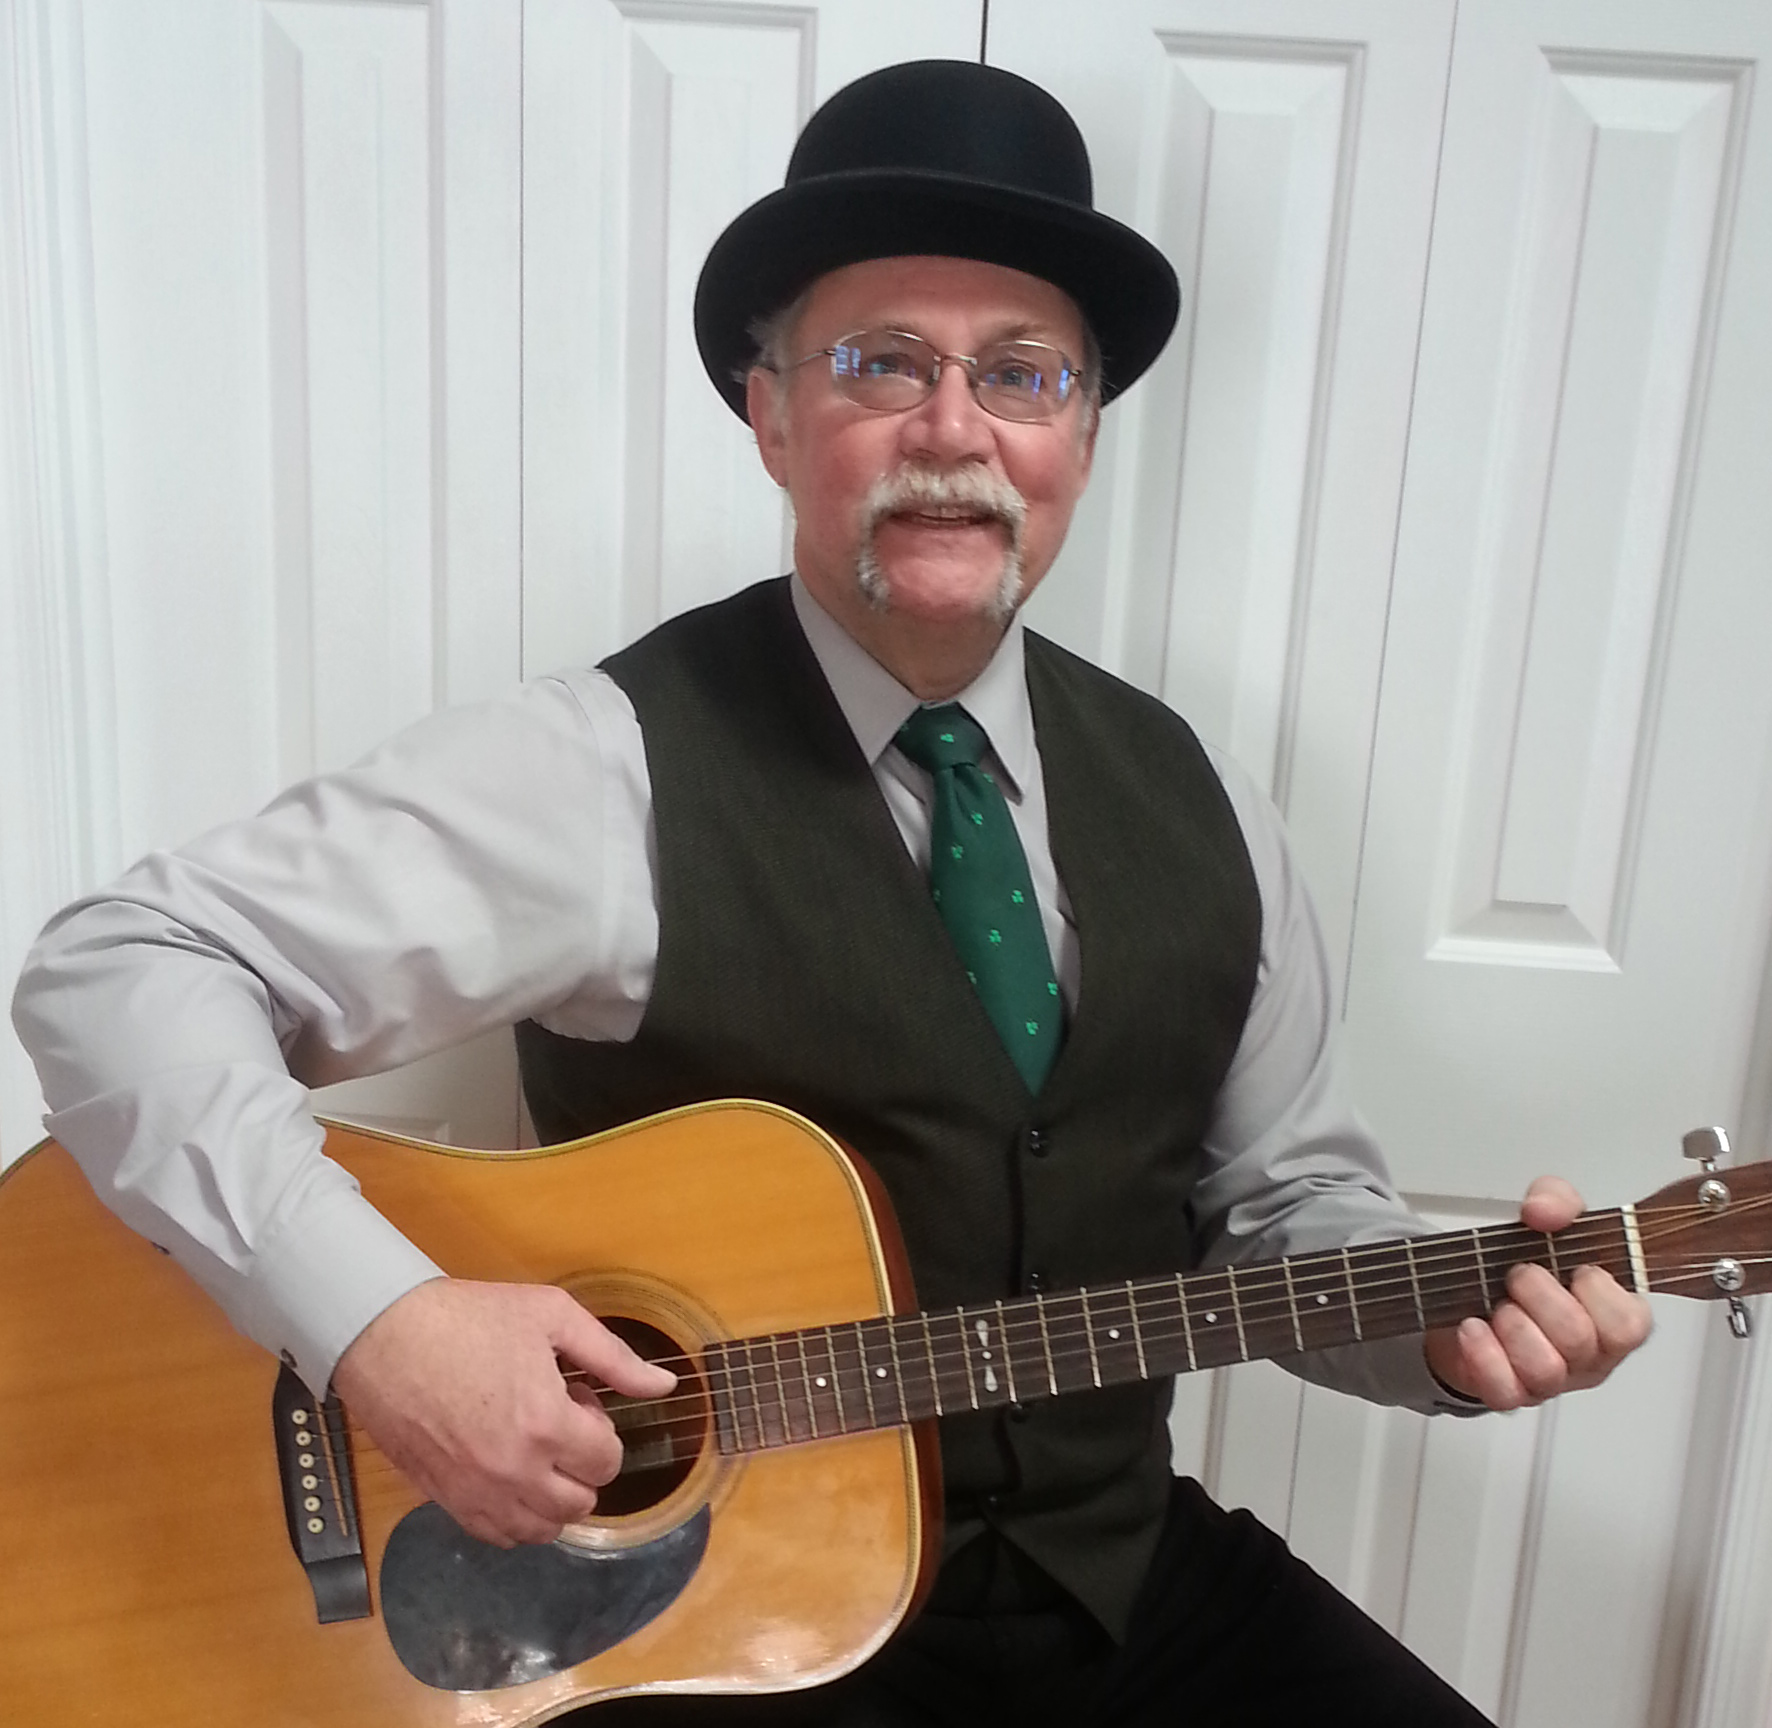 Ken Purcell on Saint Pat's